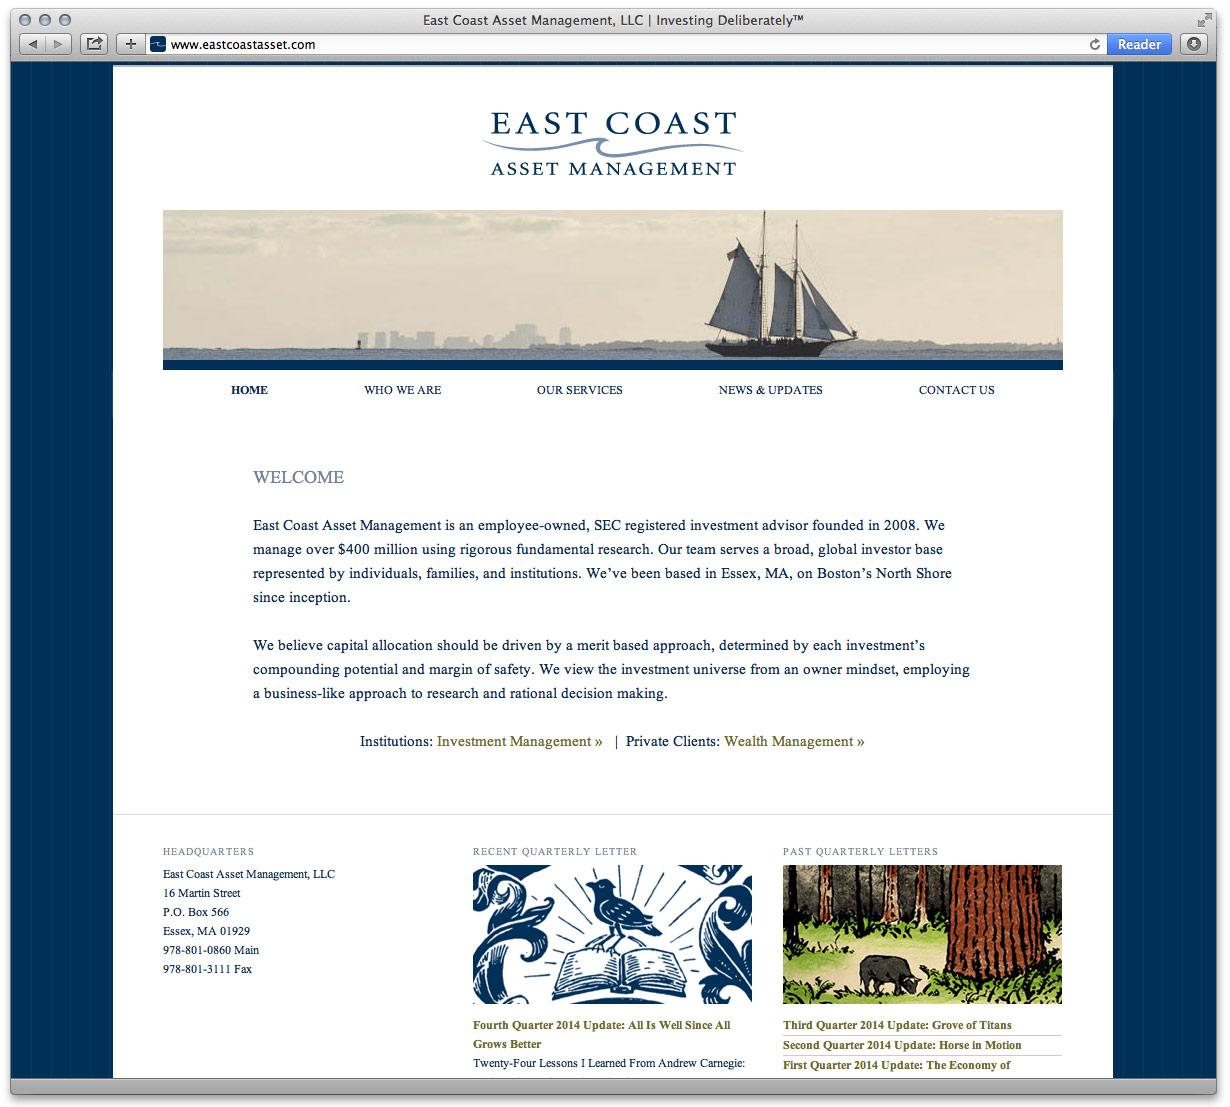 East Coast Asset Management Website